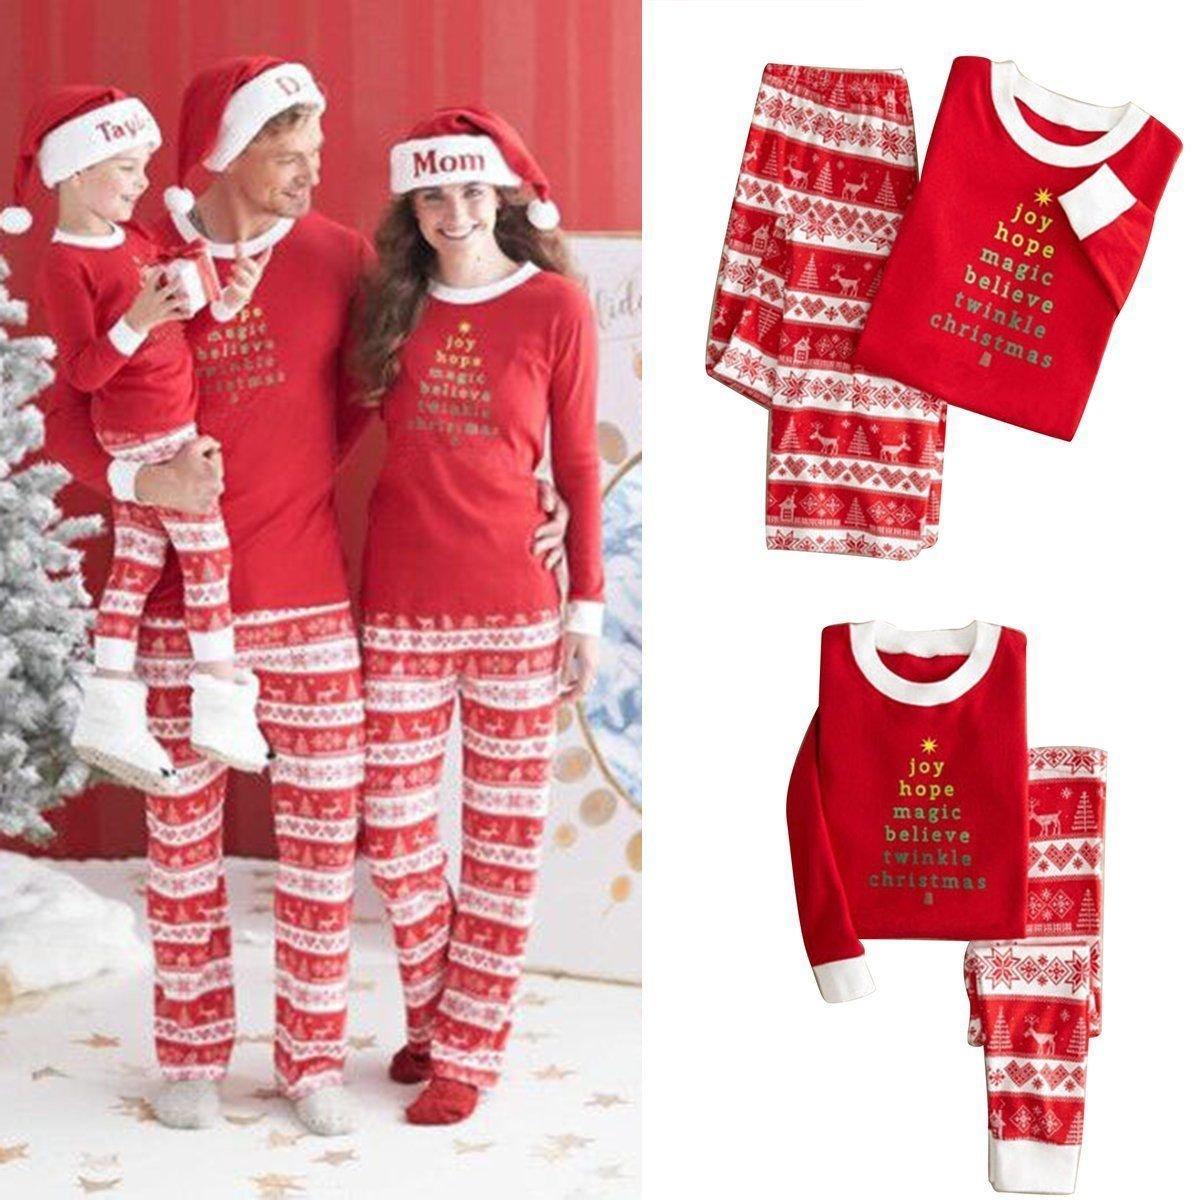 Amazon.com  JUIOKK Family Christmas Pajamas Sleepwear Set For Women Men  Children Nightwear  Toys   Games d7ec661c9